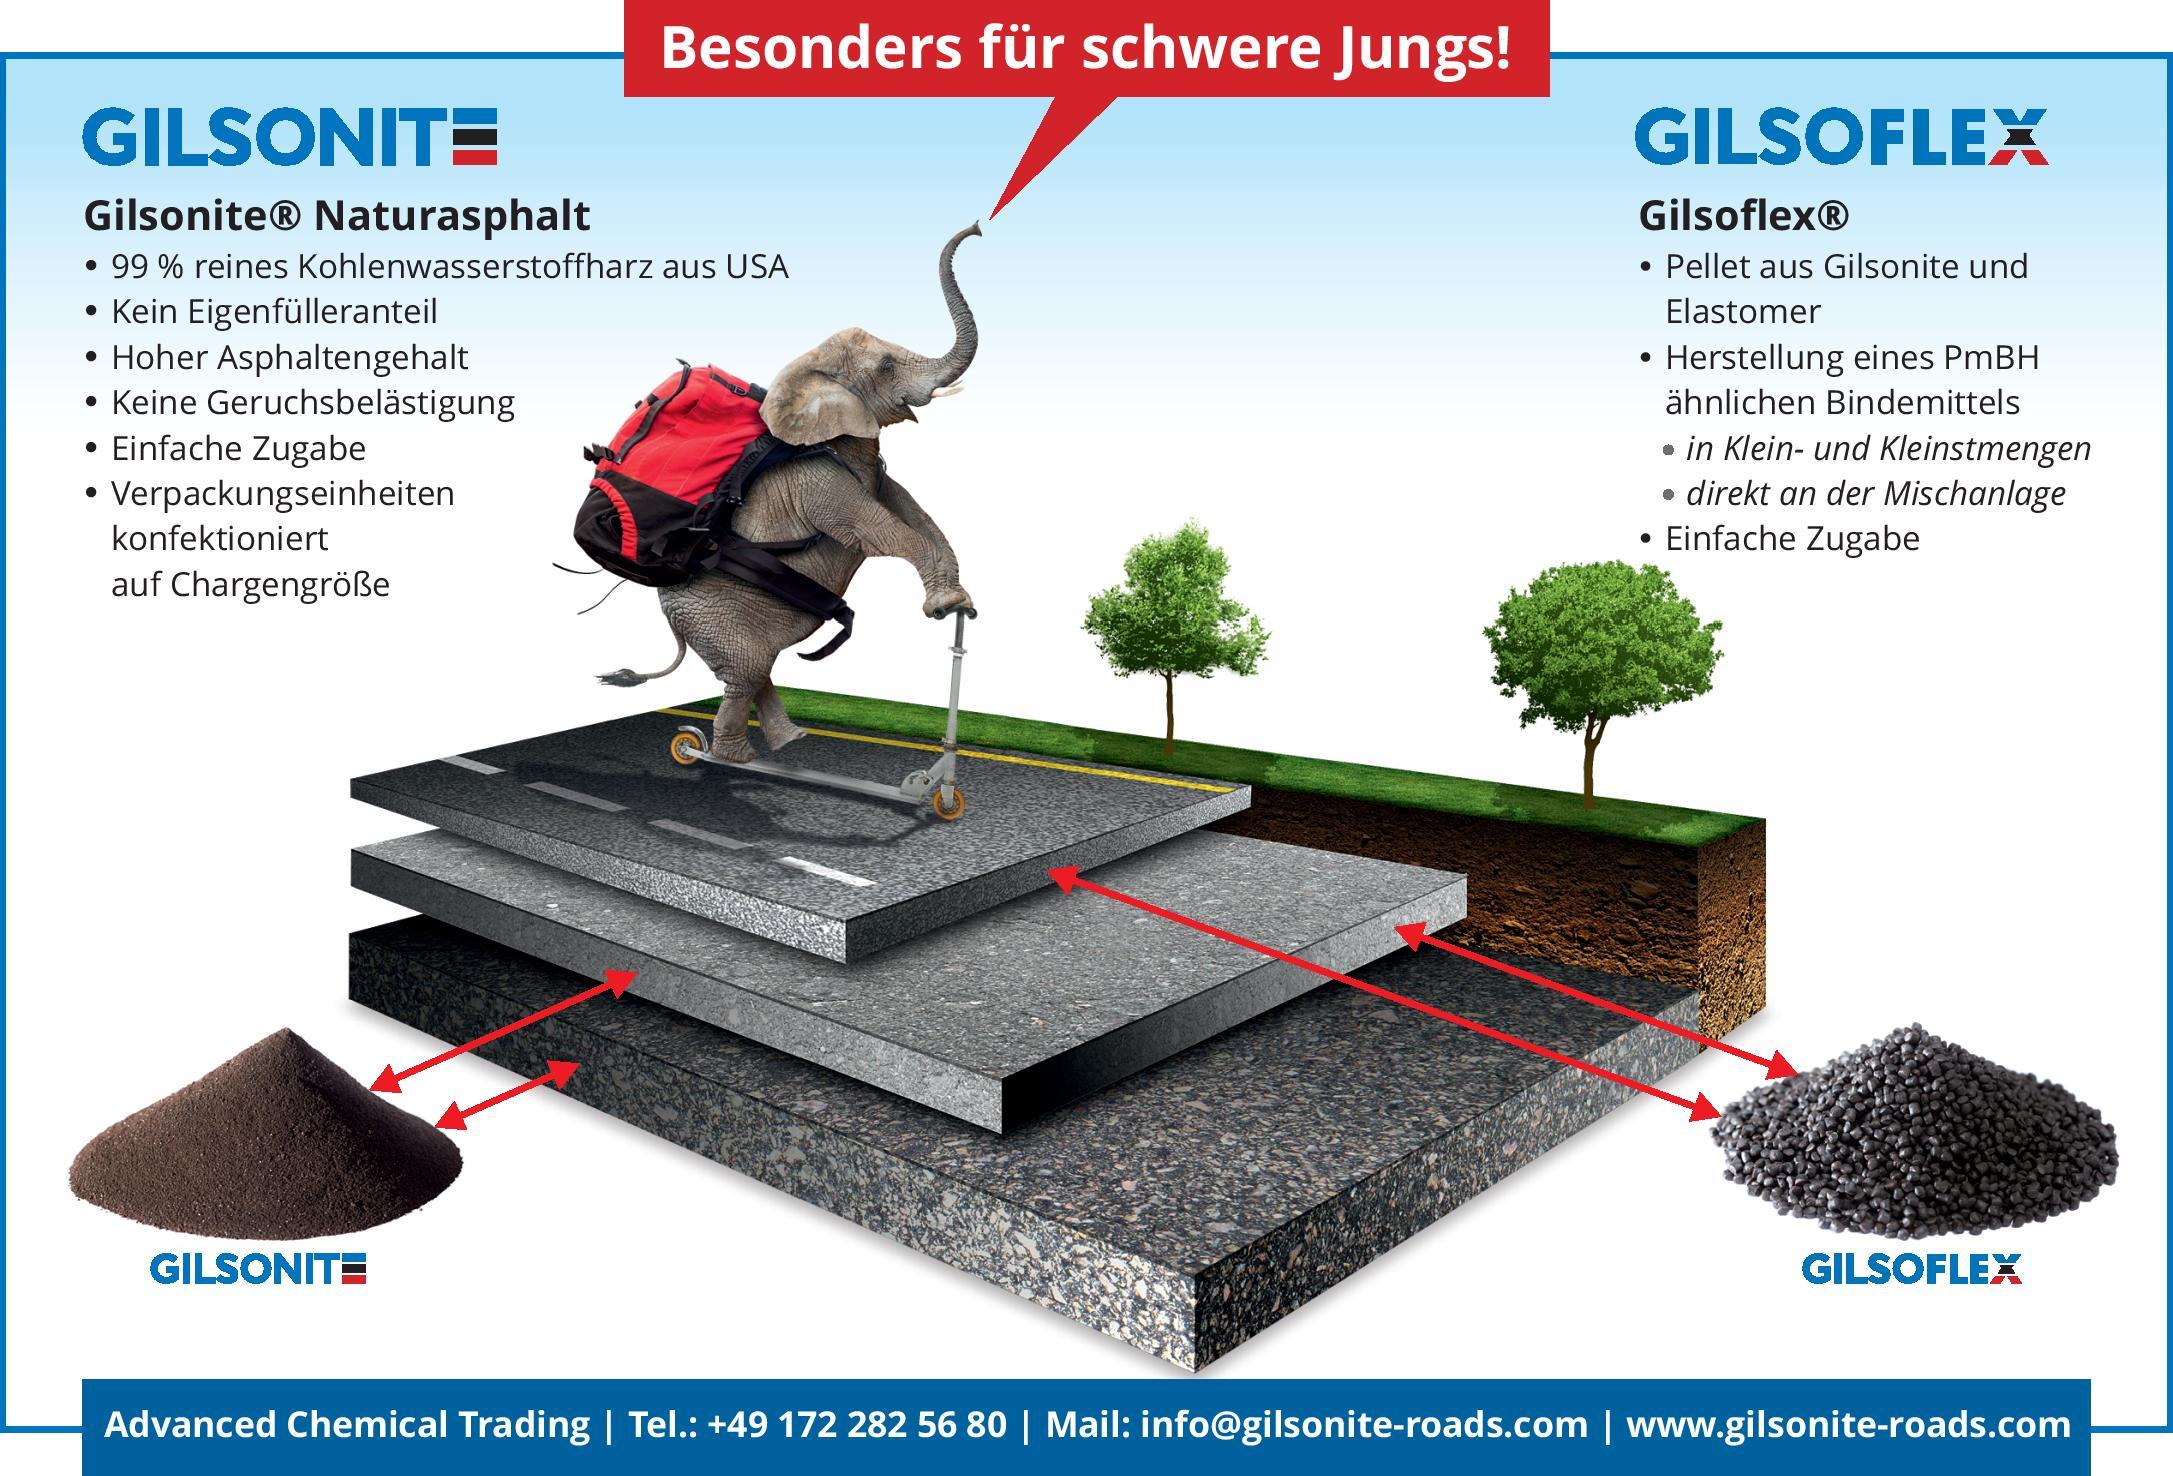 Anzeige-Gilsonite-Gilsoflex-184x125mm-page-001